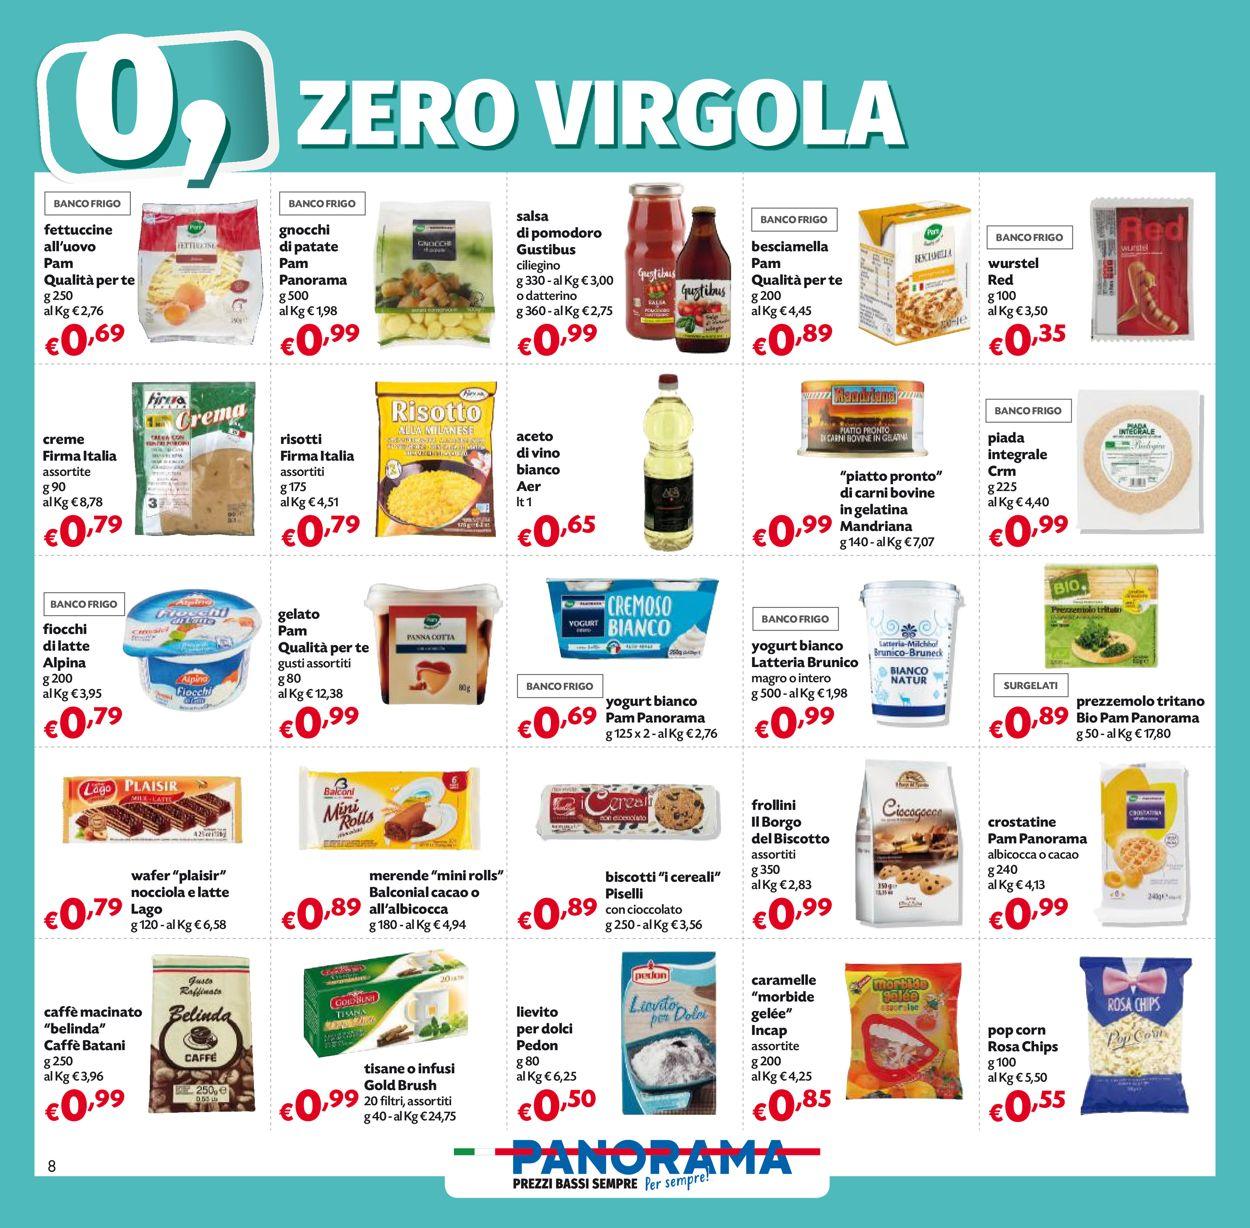 Volantino Pam Panorama - Offerte 11/02-24/02/2021 (Pagina 8)